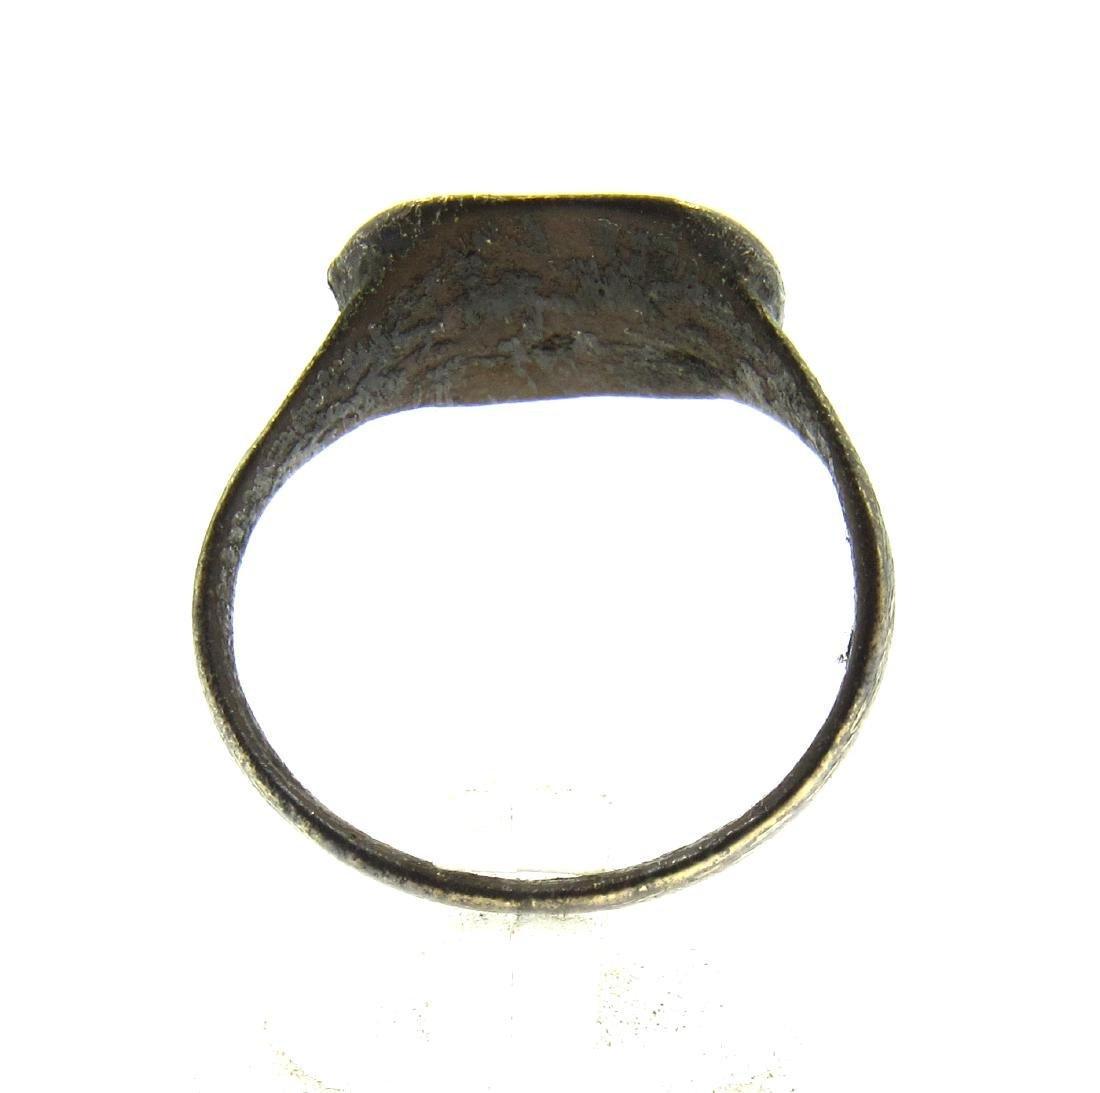 Medieval Crusaders Era Bronze Ring with Cross Motif - 3